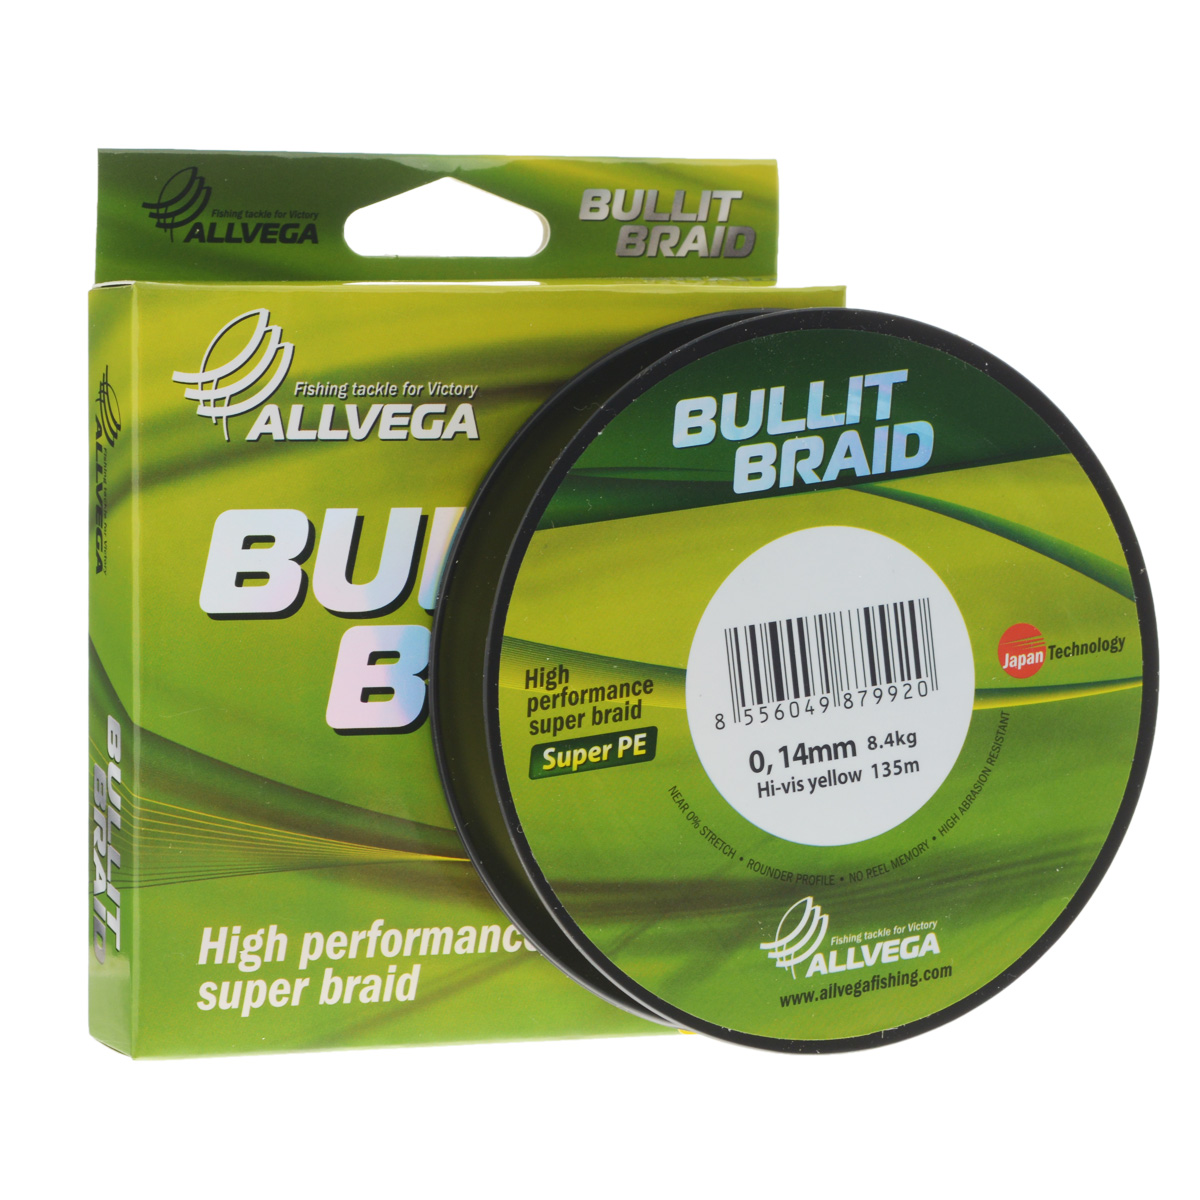 Леска плетеная Allvega Bullit Braid, цвет: ярко-желтый, 135 м, 0,14 мм, 8,4 кг